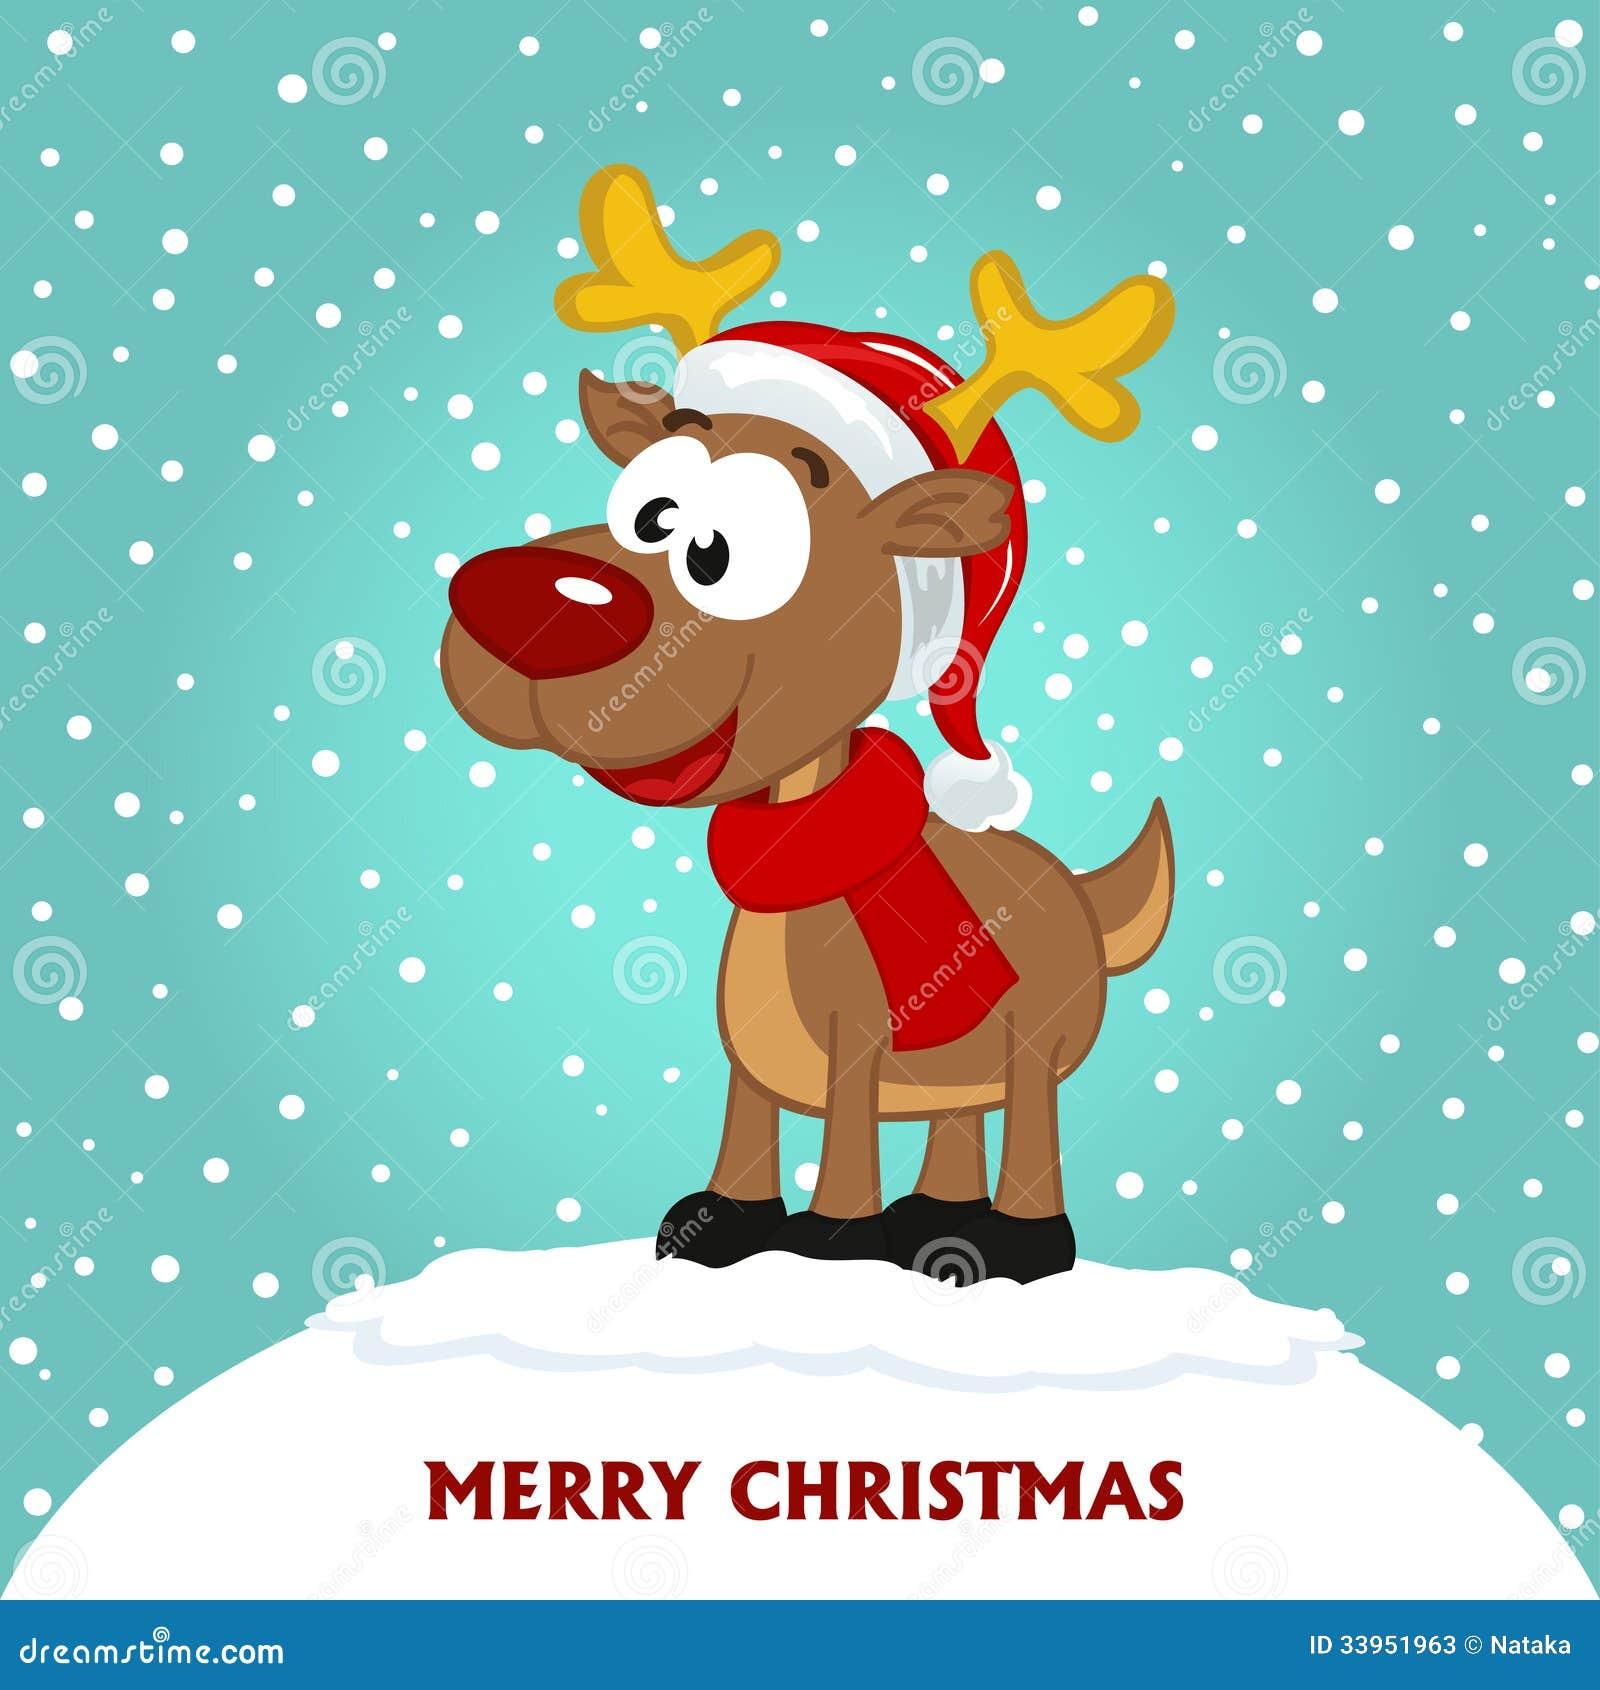 Deer Christmas Decorations